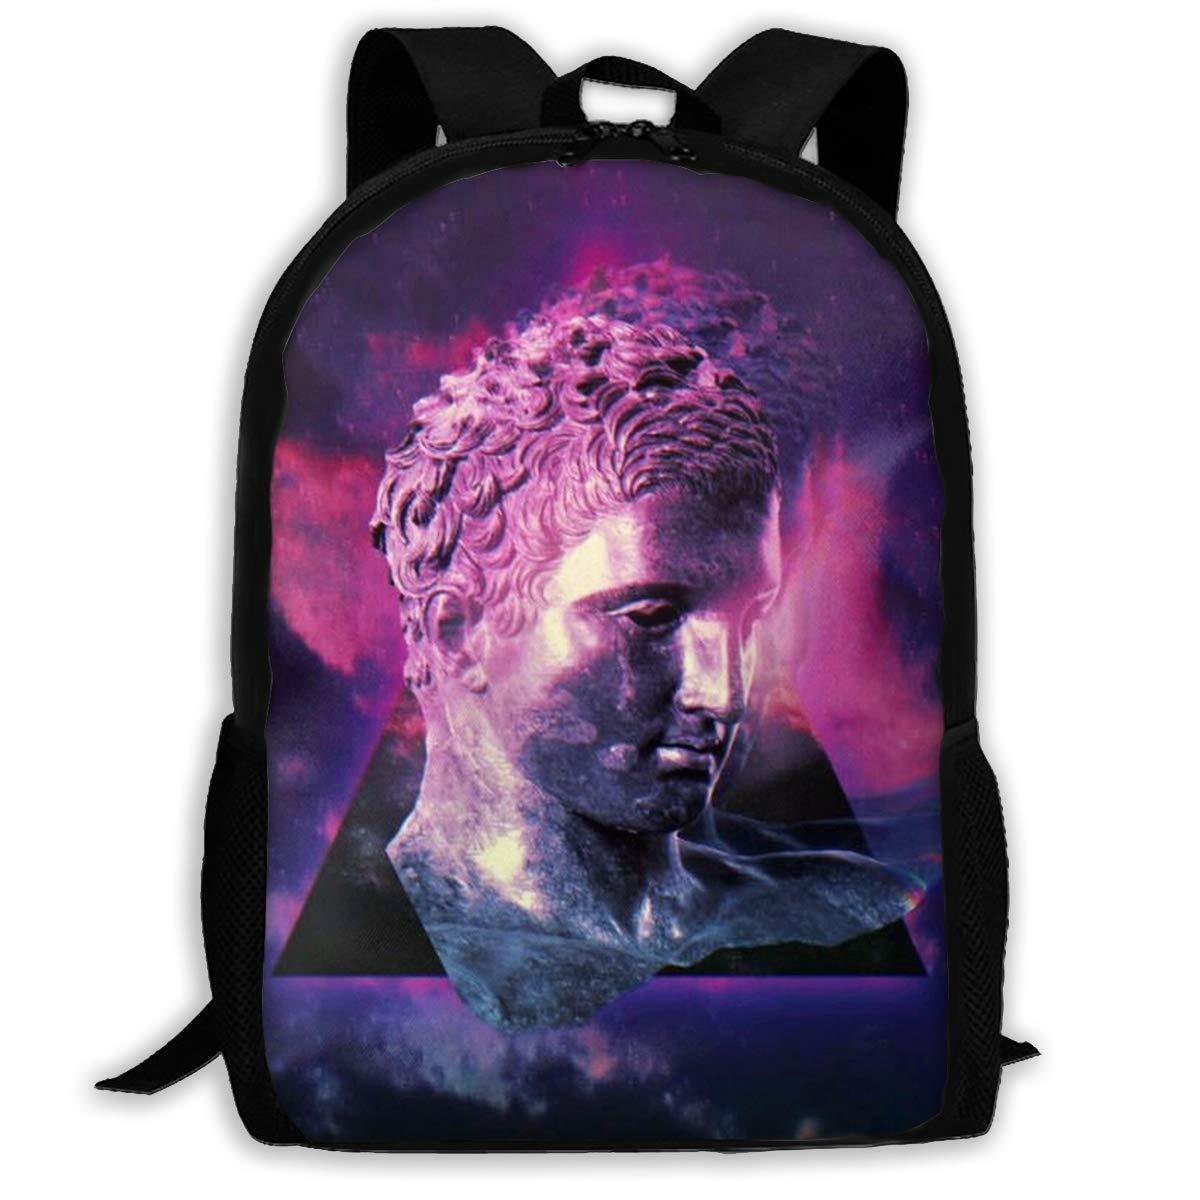 haiyingzhiyi Backpacks Girl'S Shoulder Bag Bookbags School Season The Statue Traveling Bags